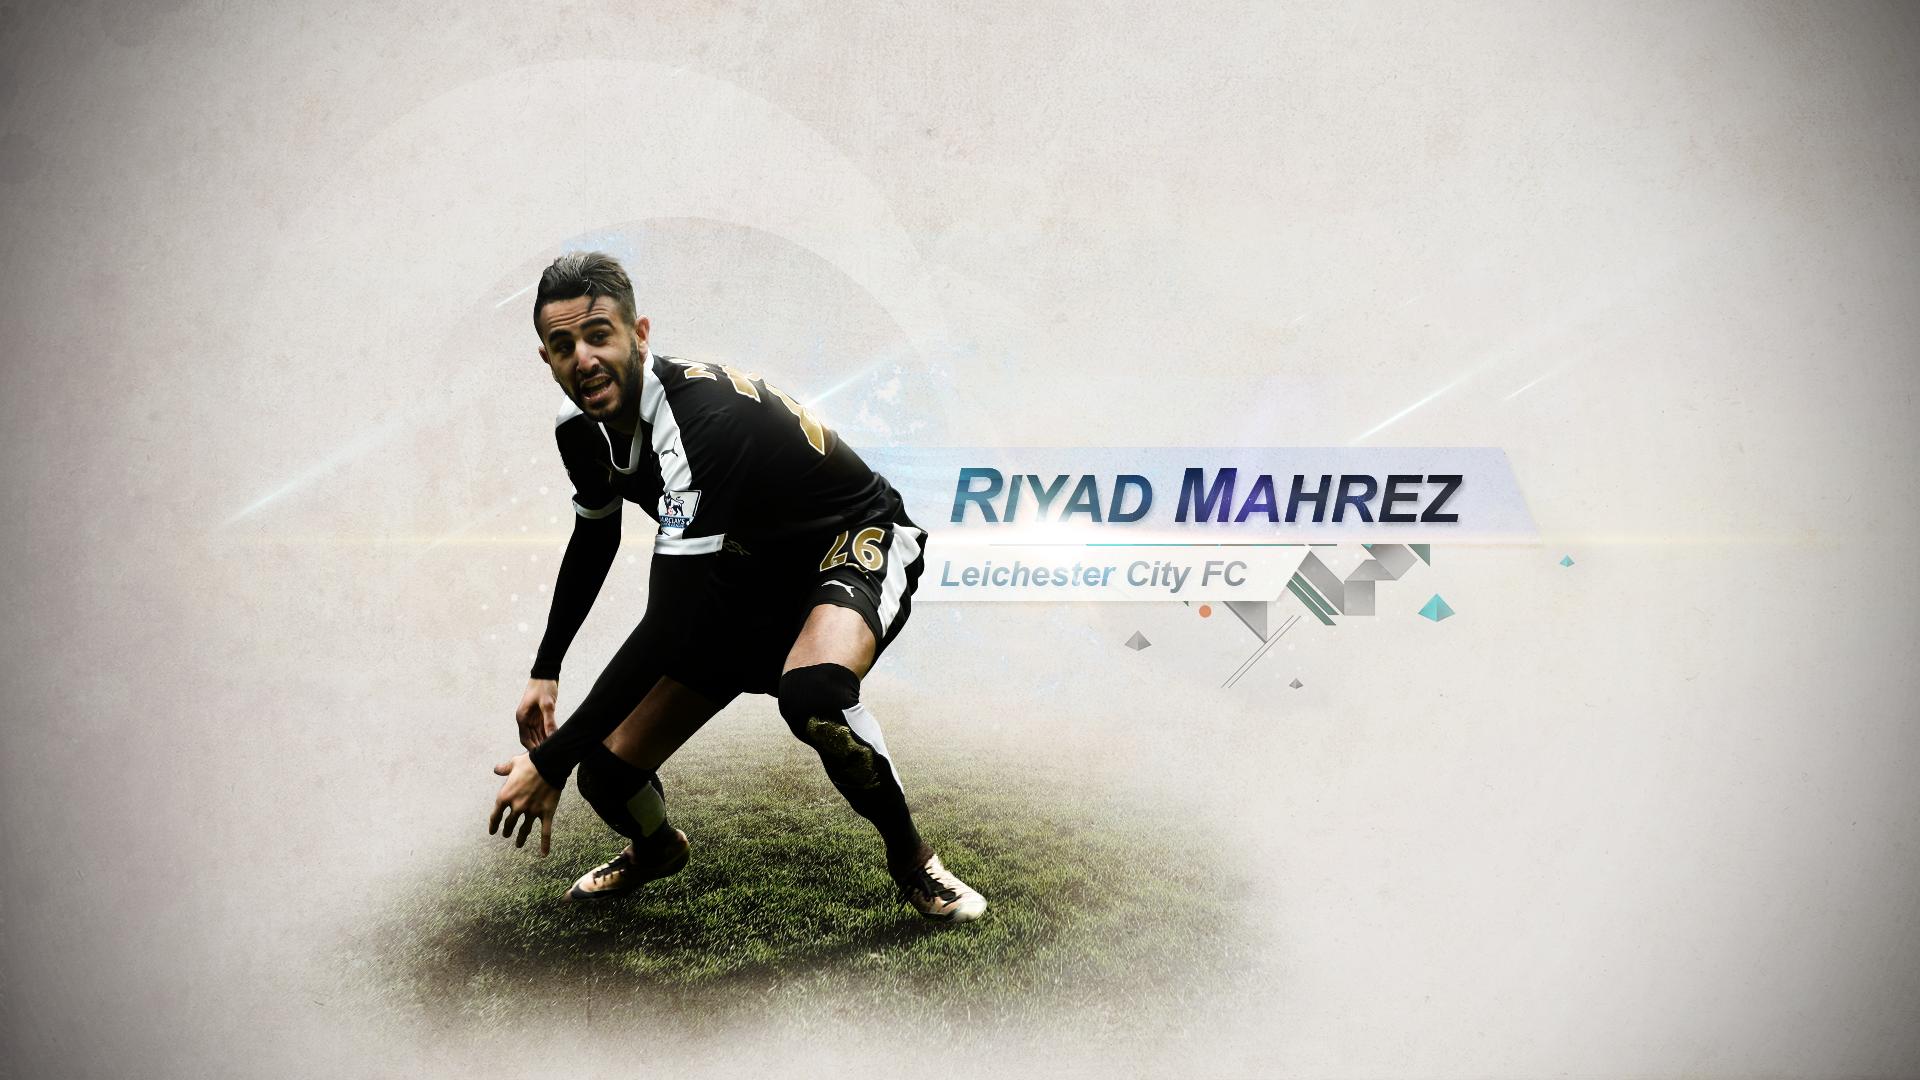 #1 Riyad Mahrez By TommyniusGFX On DeviantArt